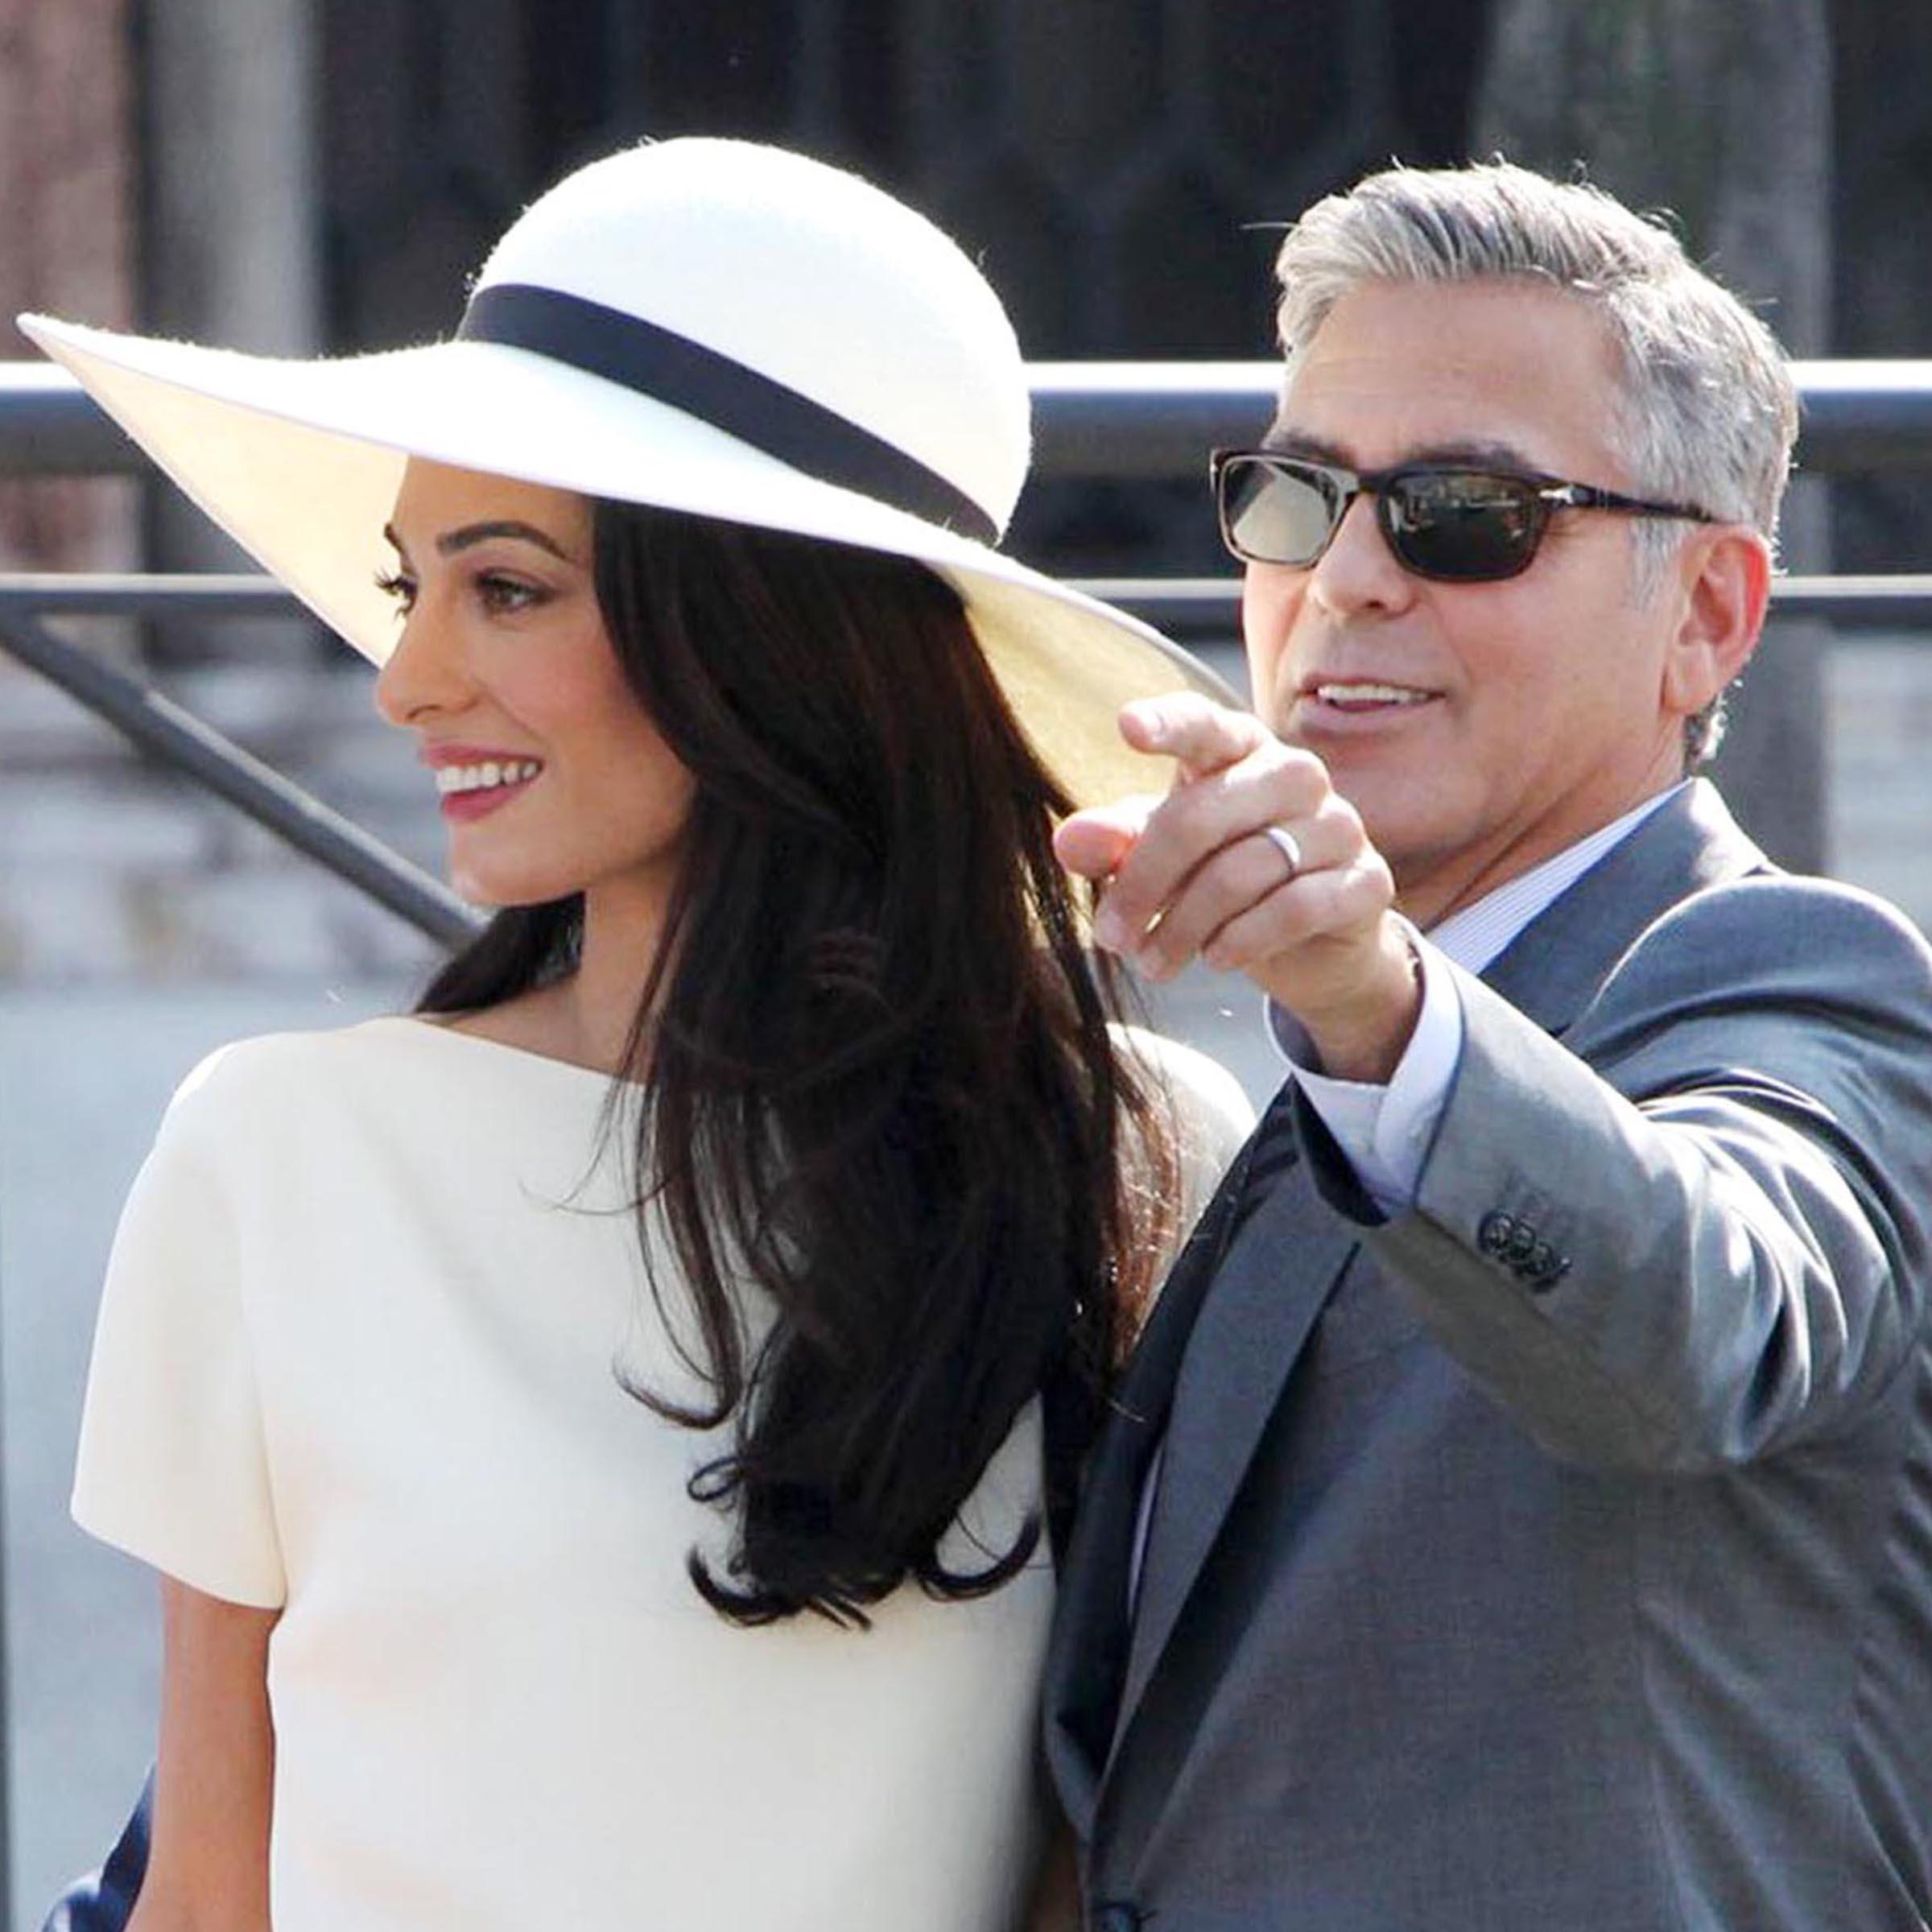 Hollywood Actor George Clooney and Amal Alamuddin's Platinum